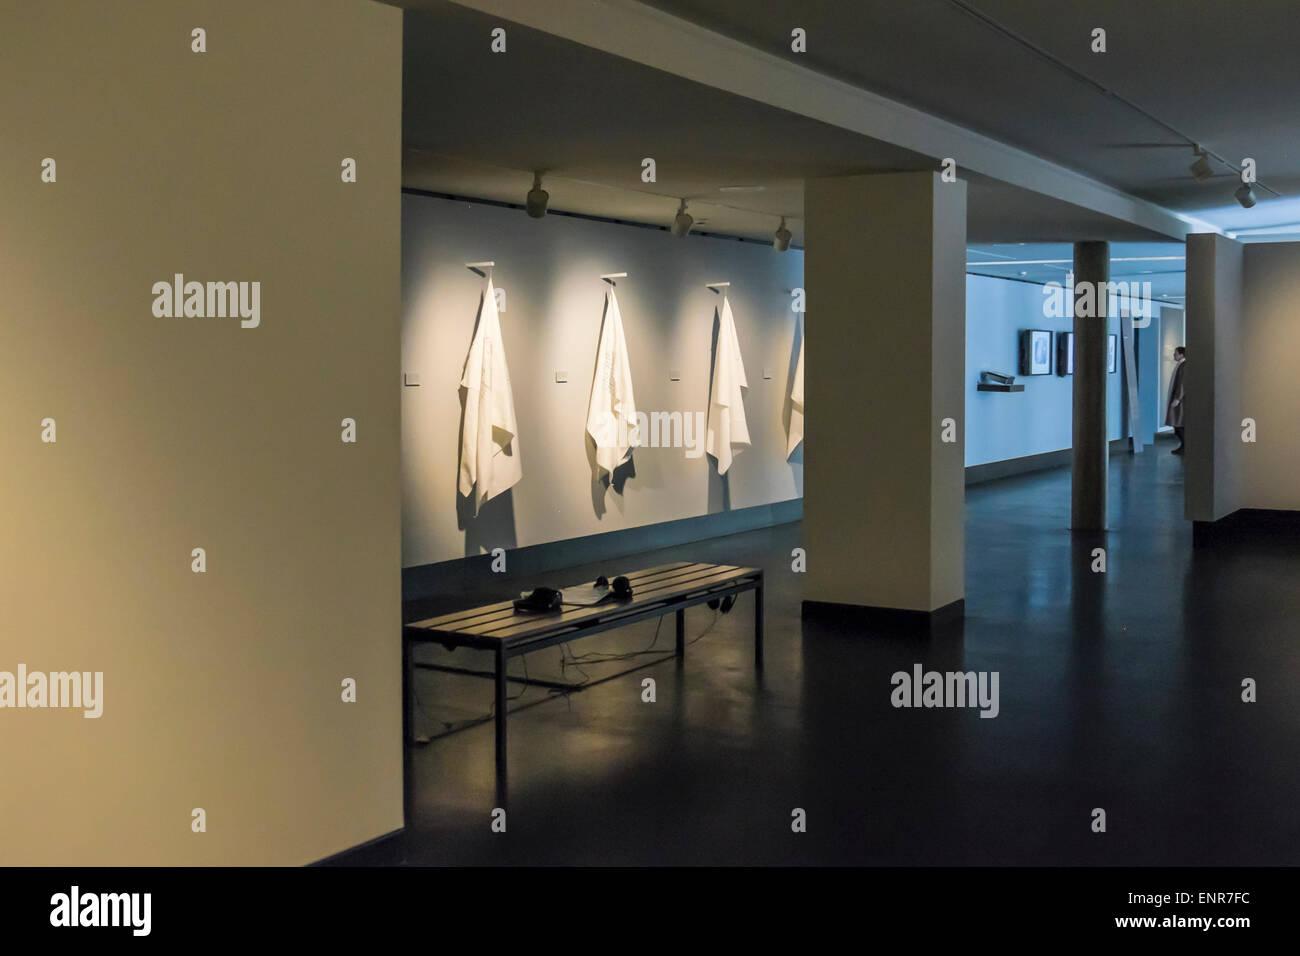 C/O Berlin Modern Photographic And Art Gallery Interior In Amerika Haus,  Berlin